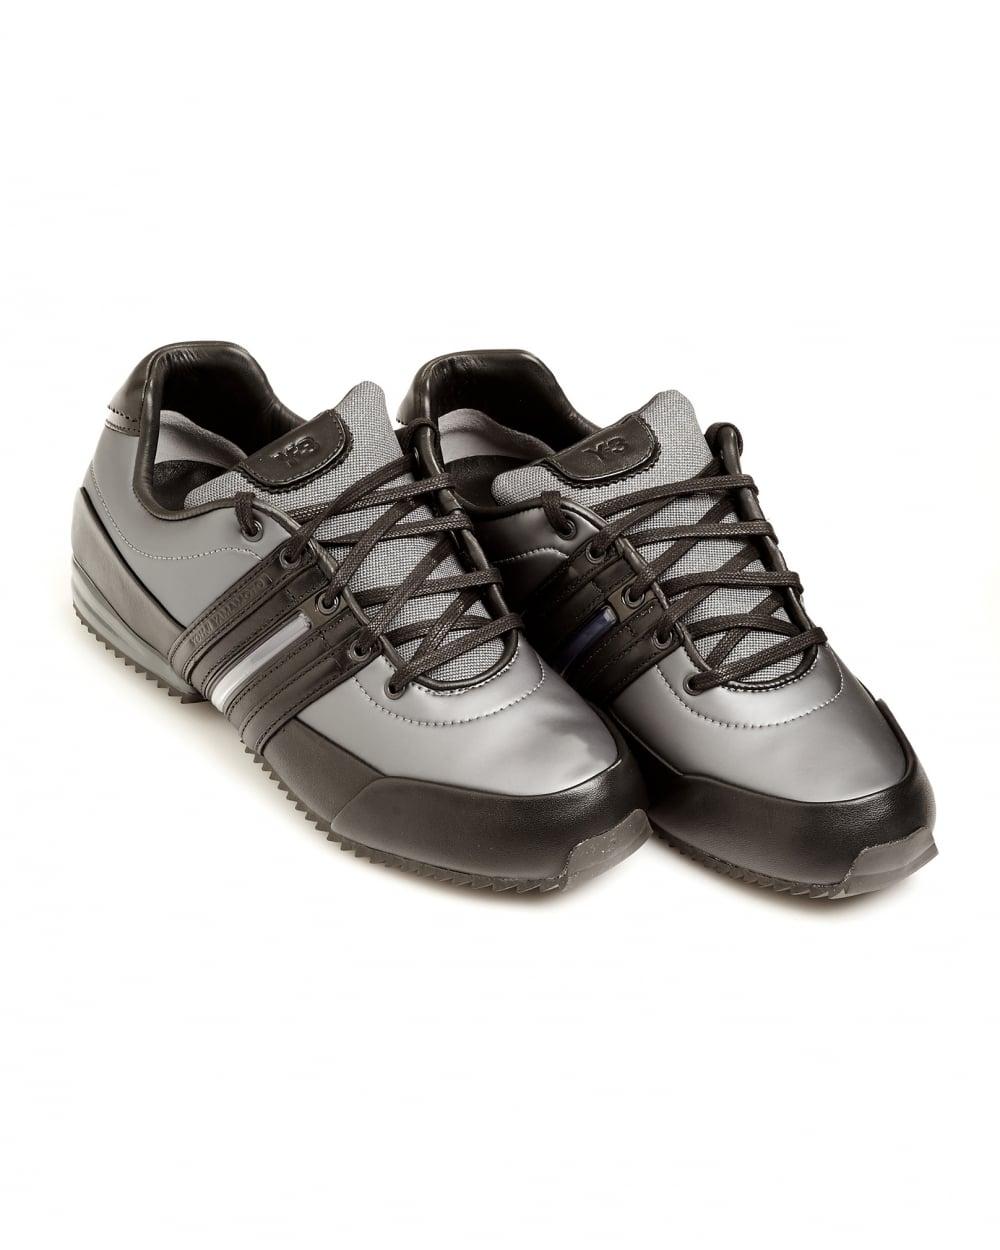 adidas y3 grey